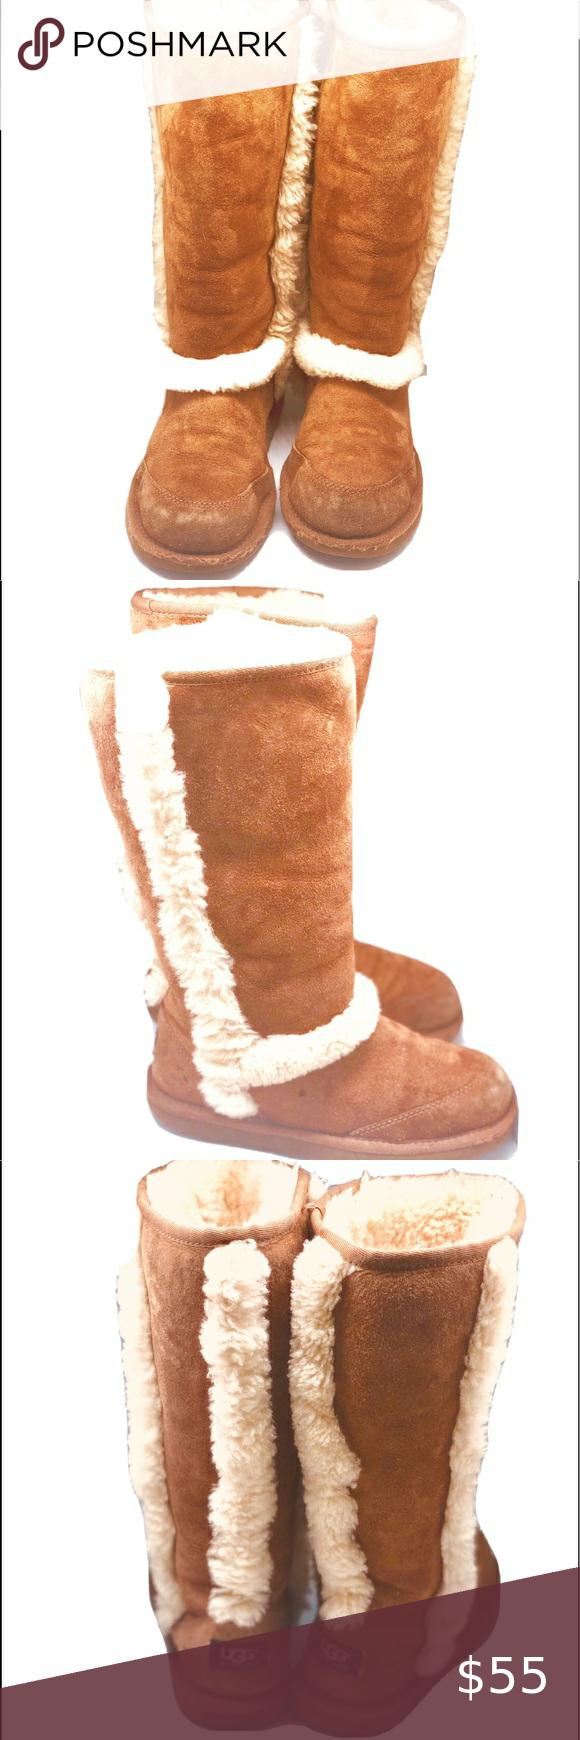 Kids ugg boots, Kids uggs, Kids boots